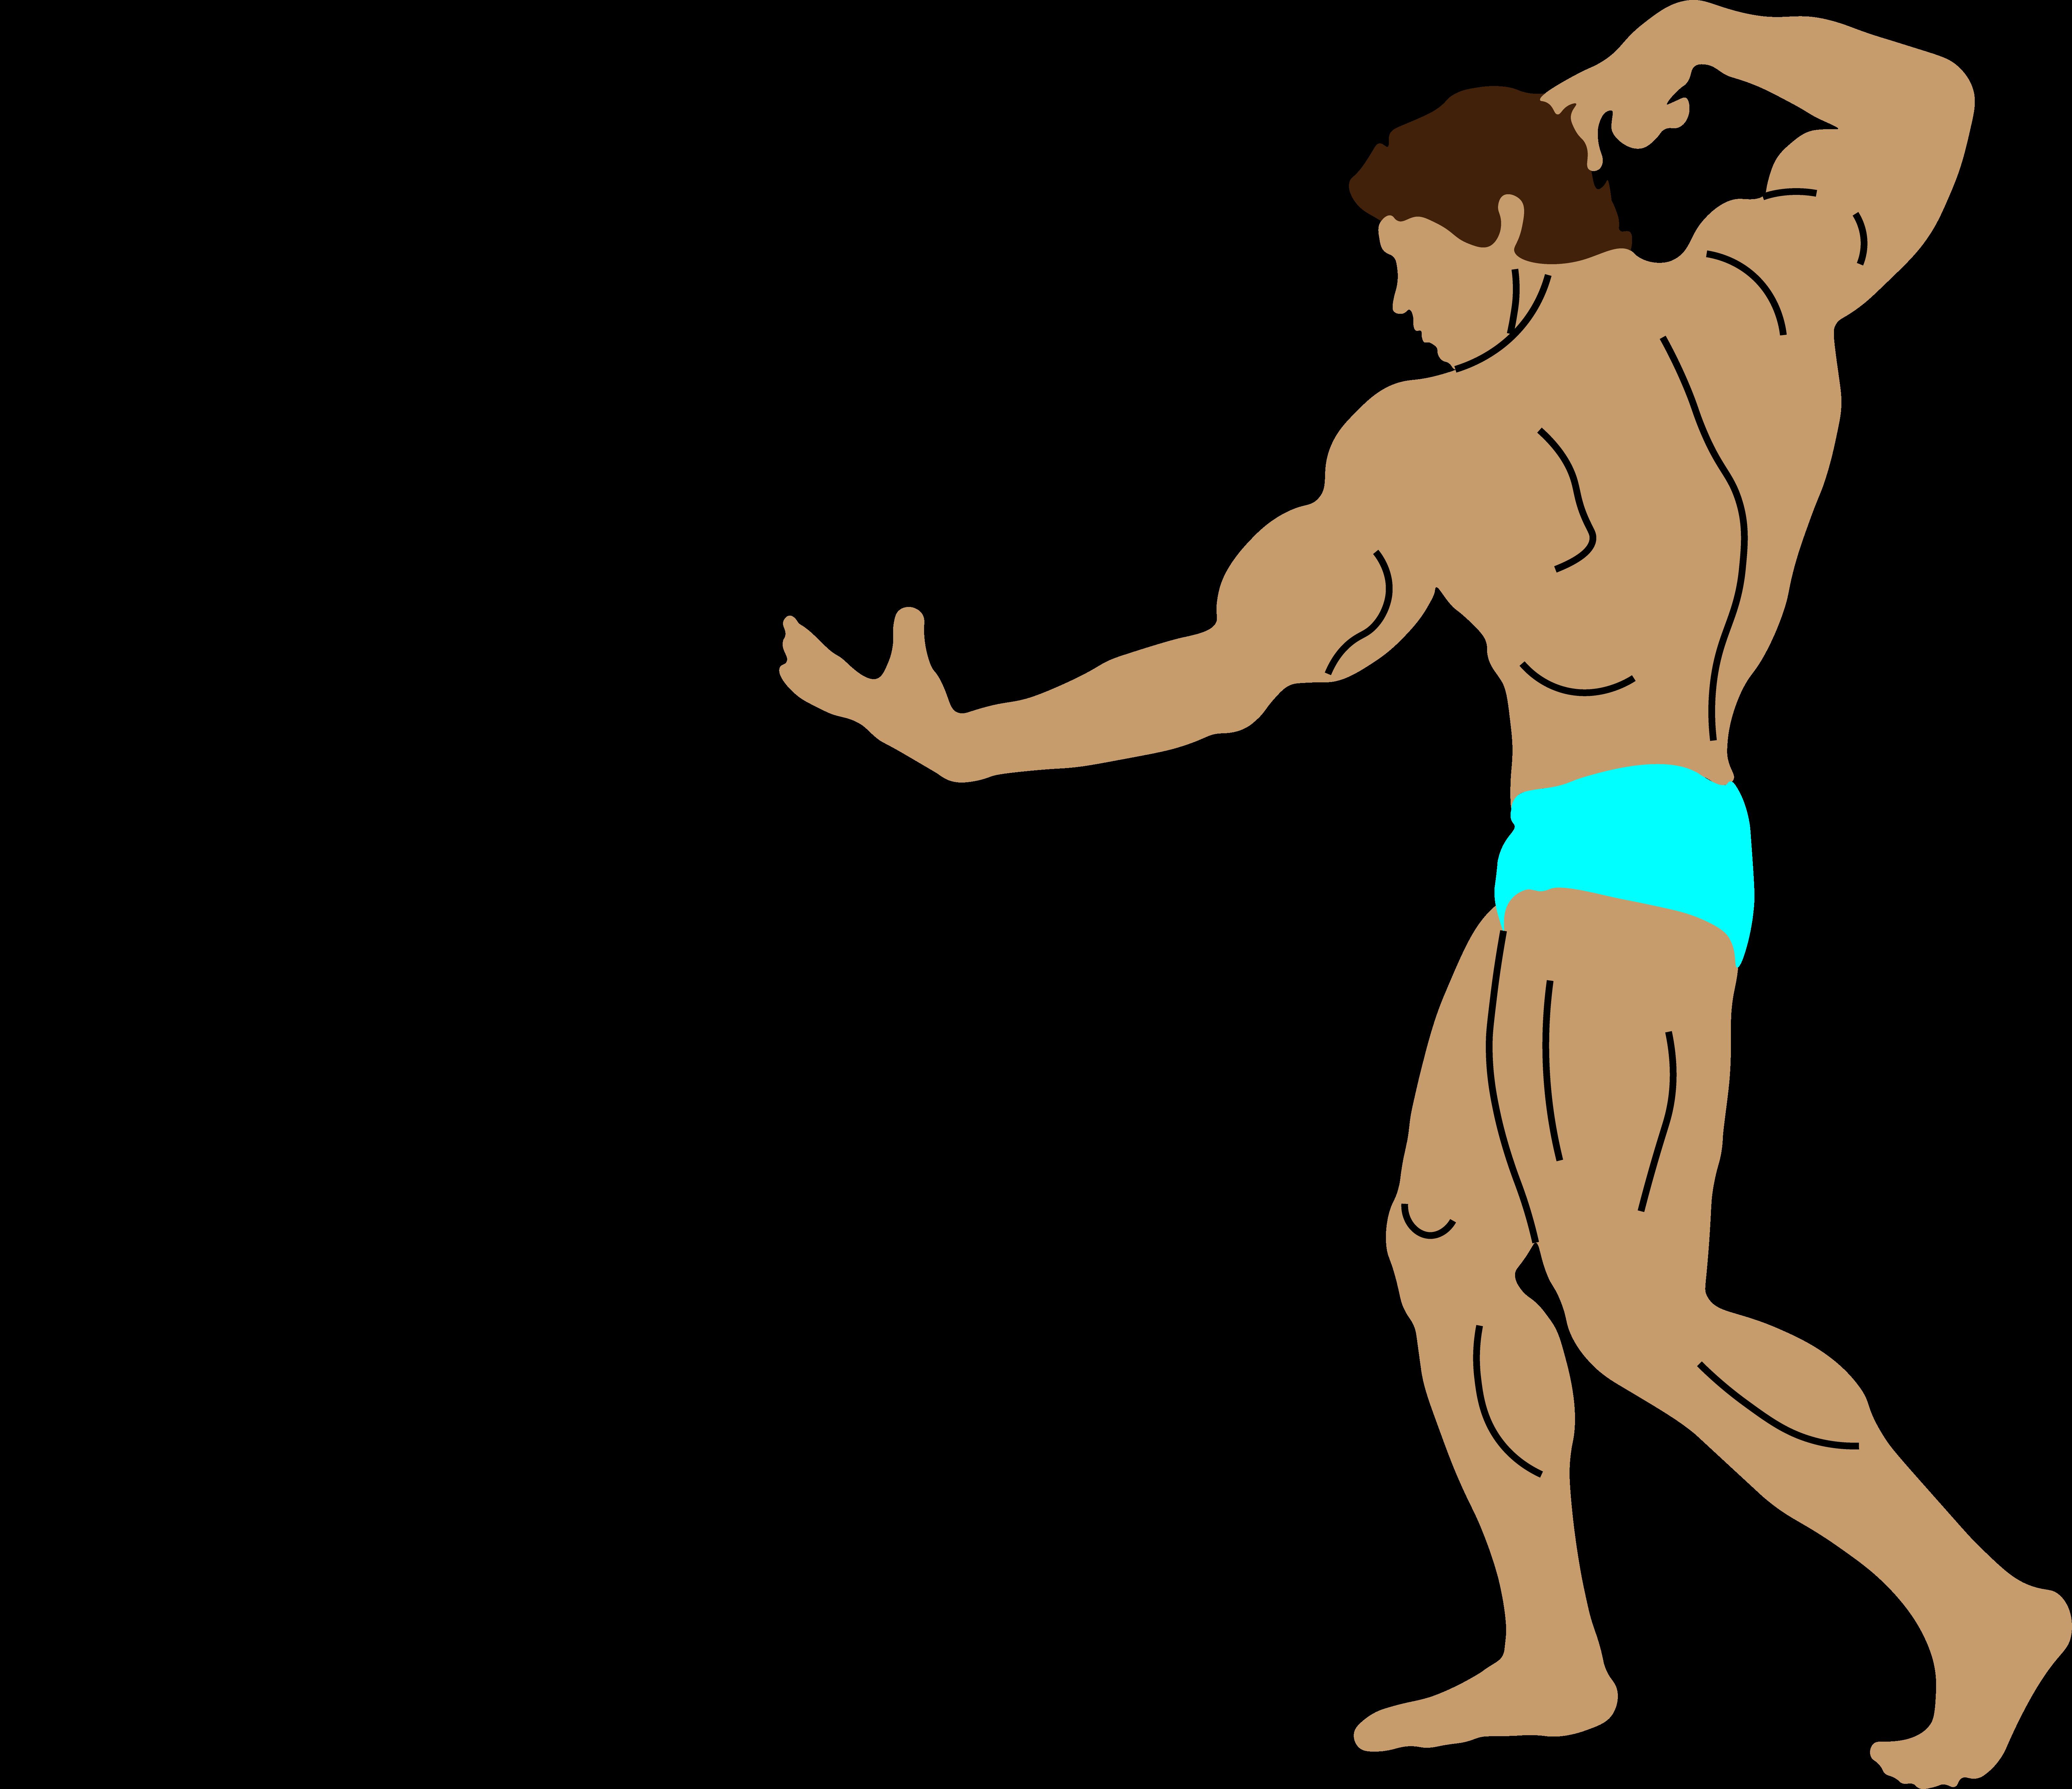 Classic Arnold Schwarzenegger Bodybuilding Pose